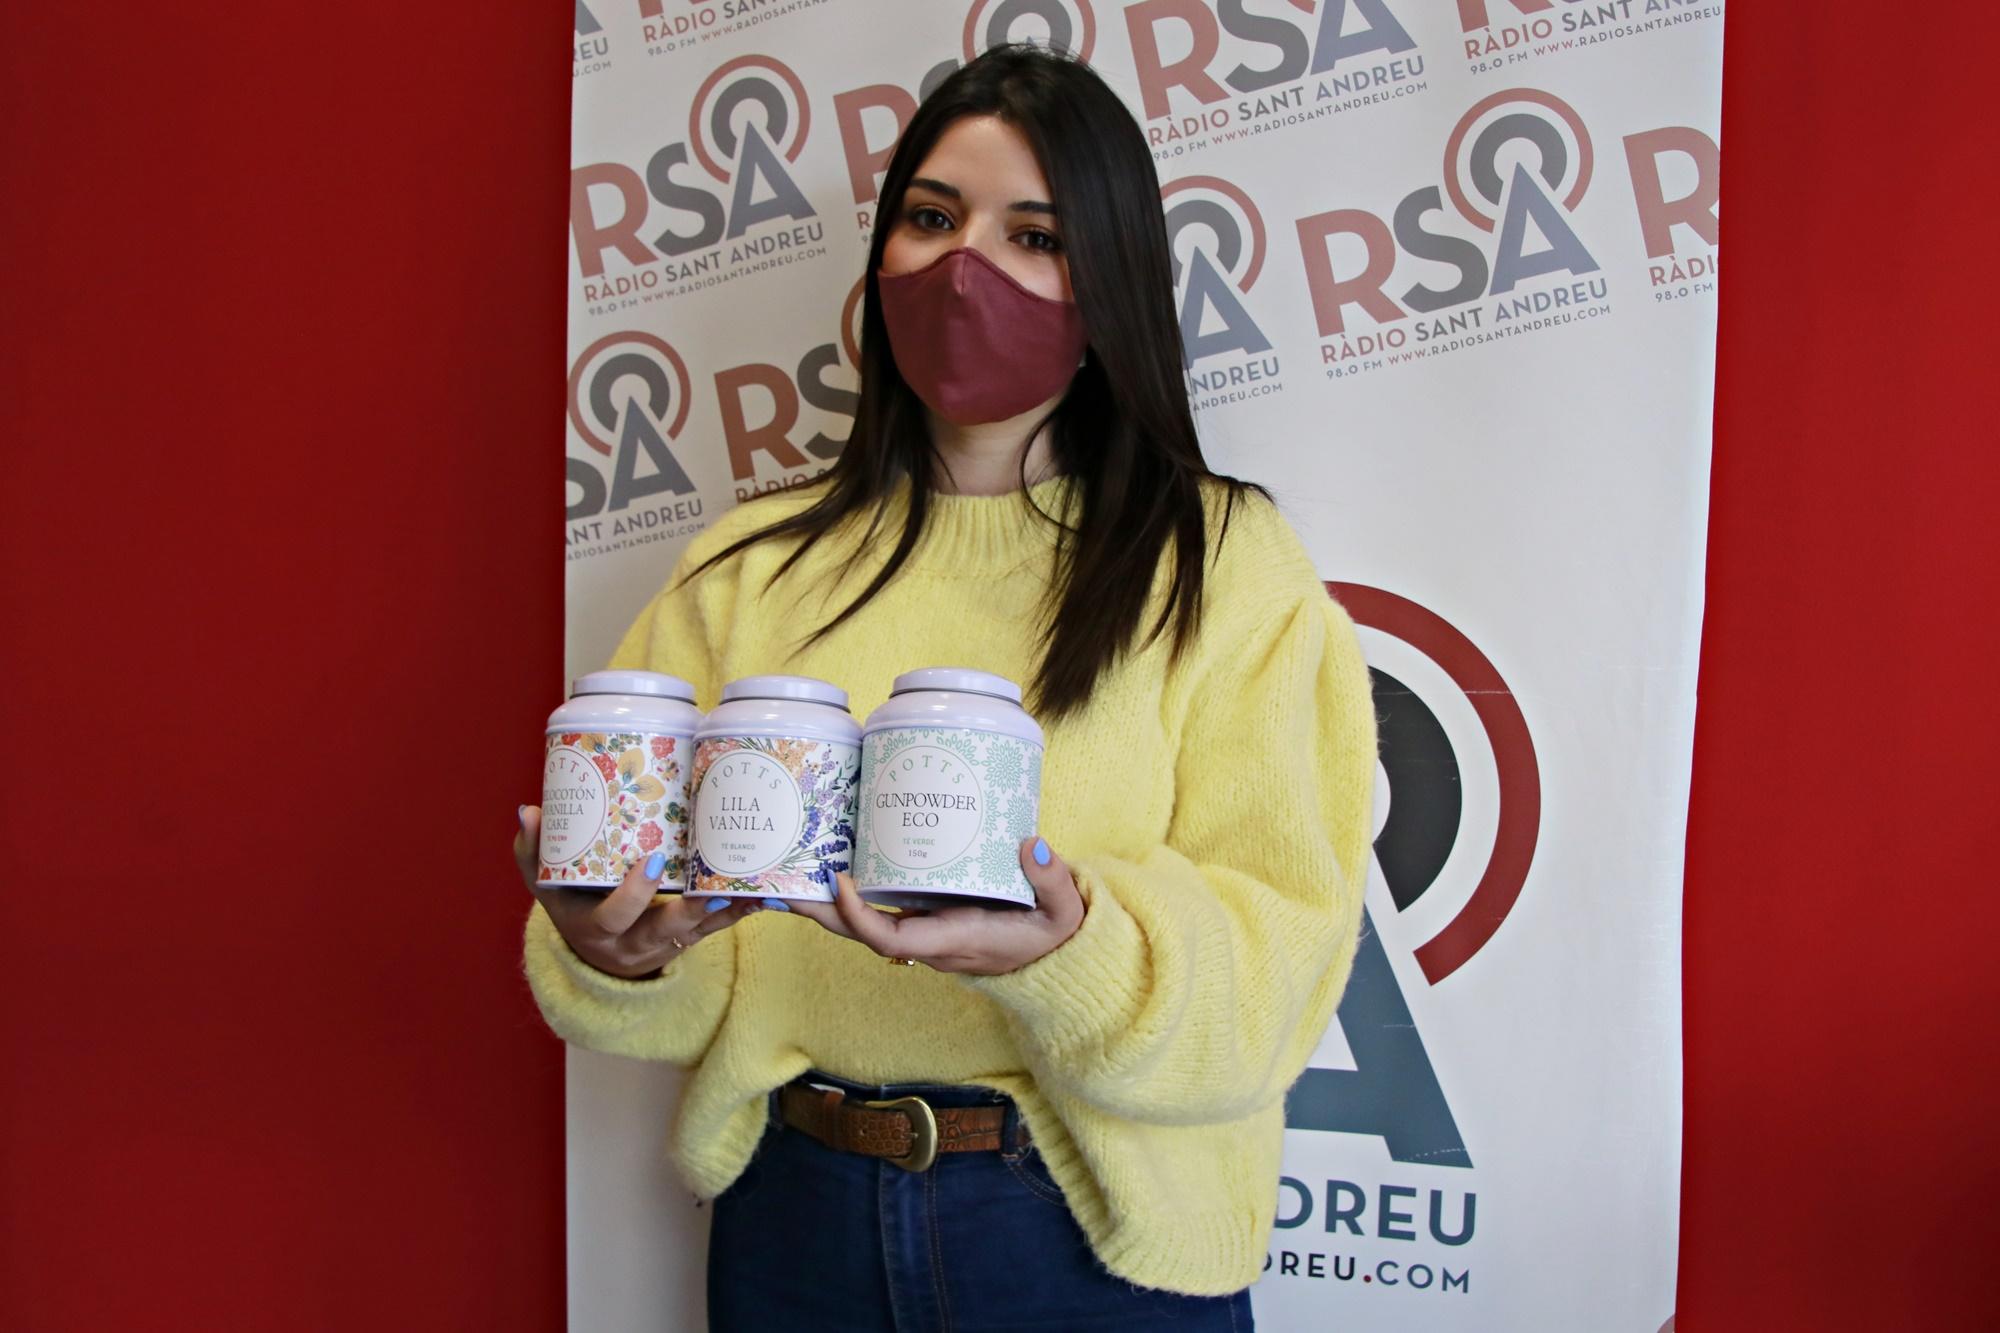 Potts TEA Cristina Castro